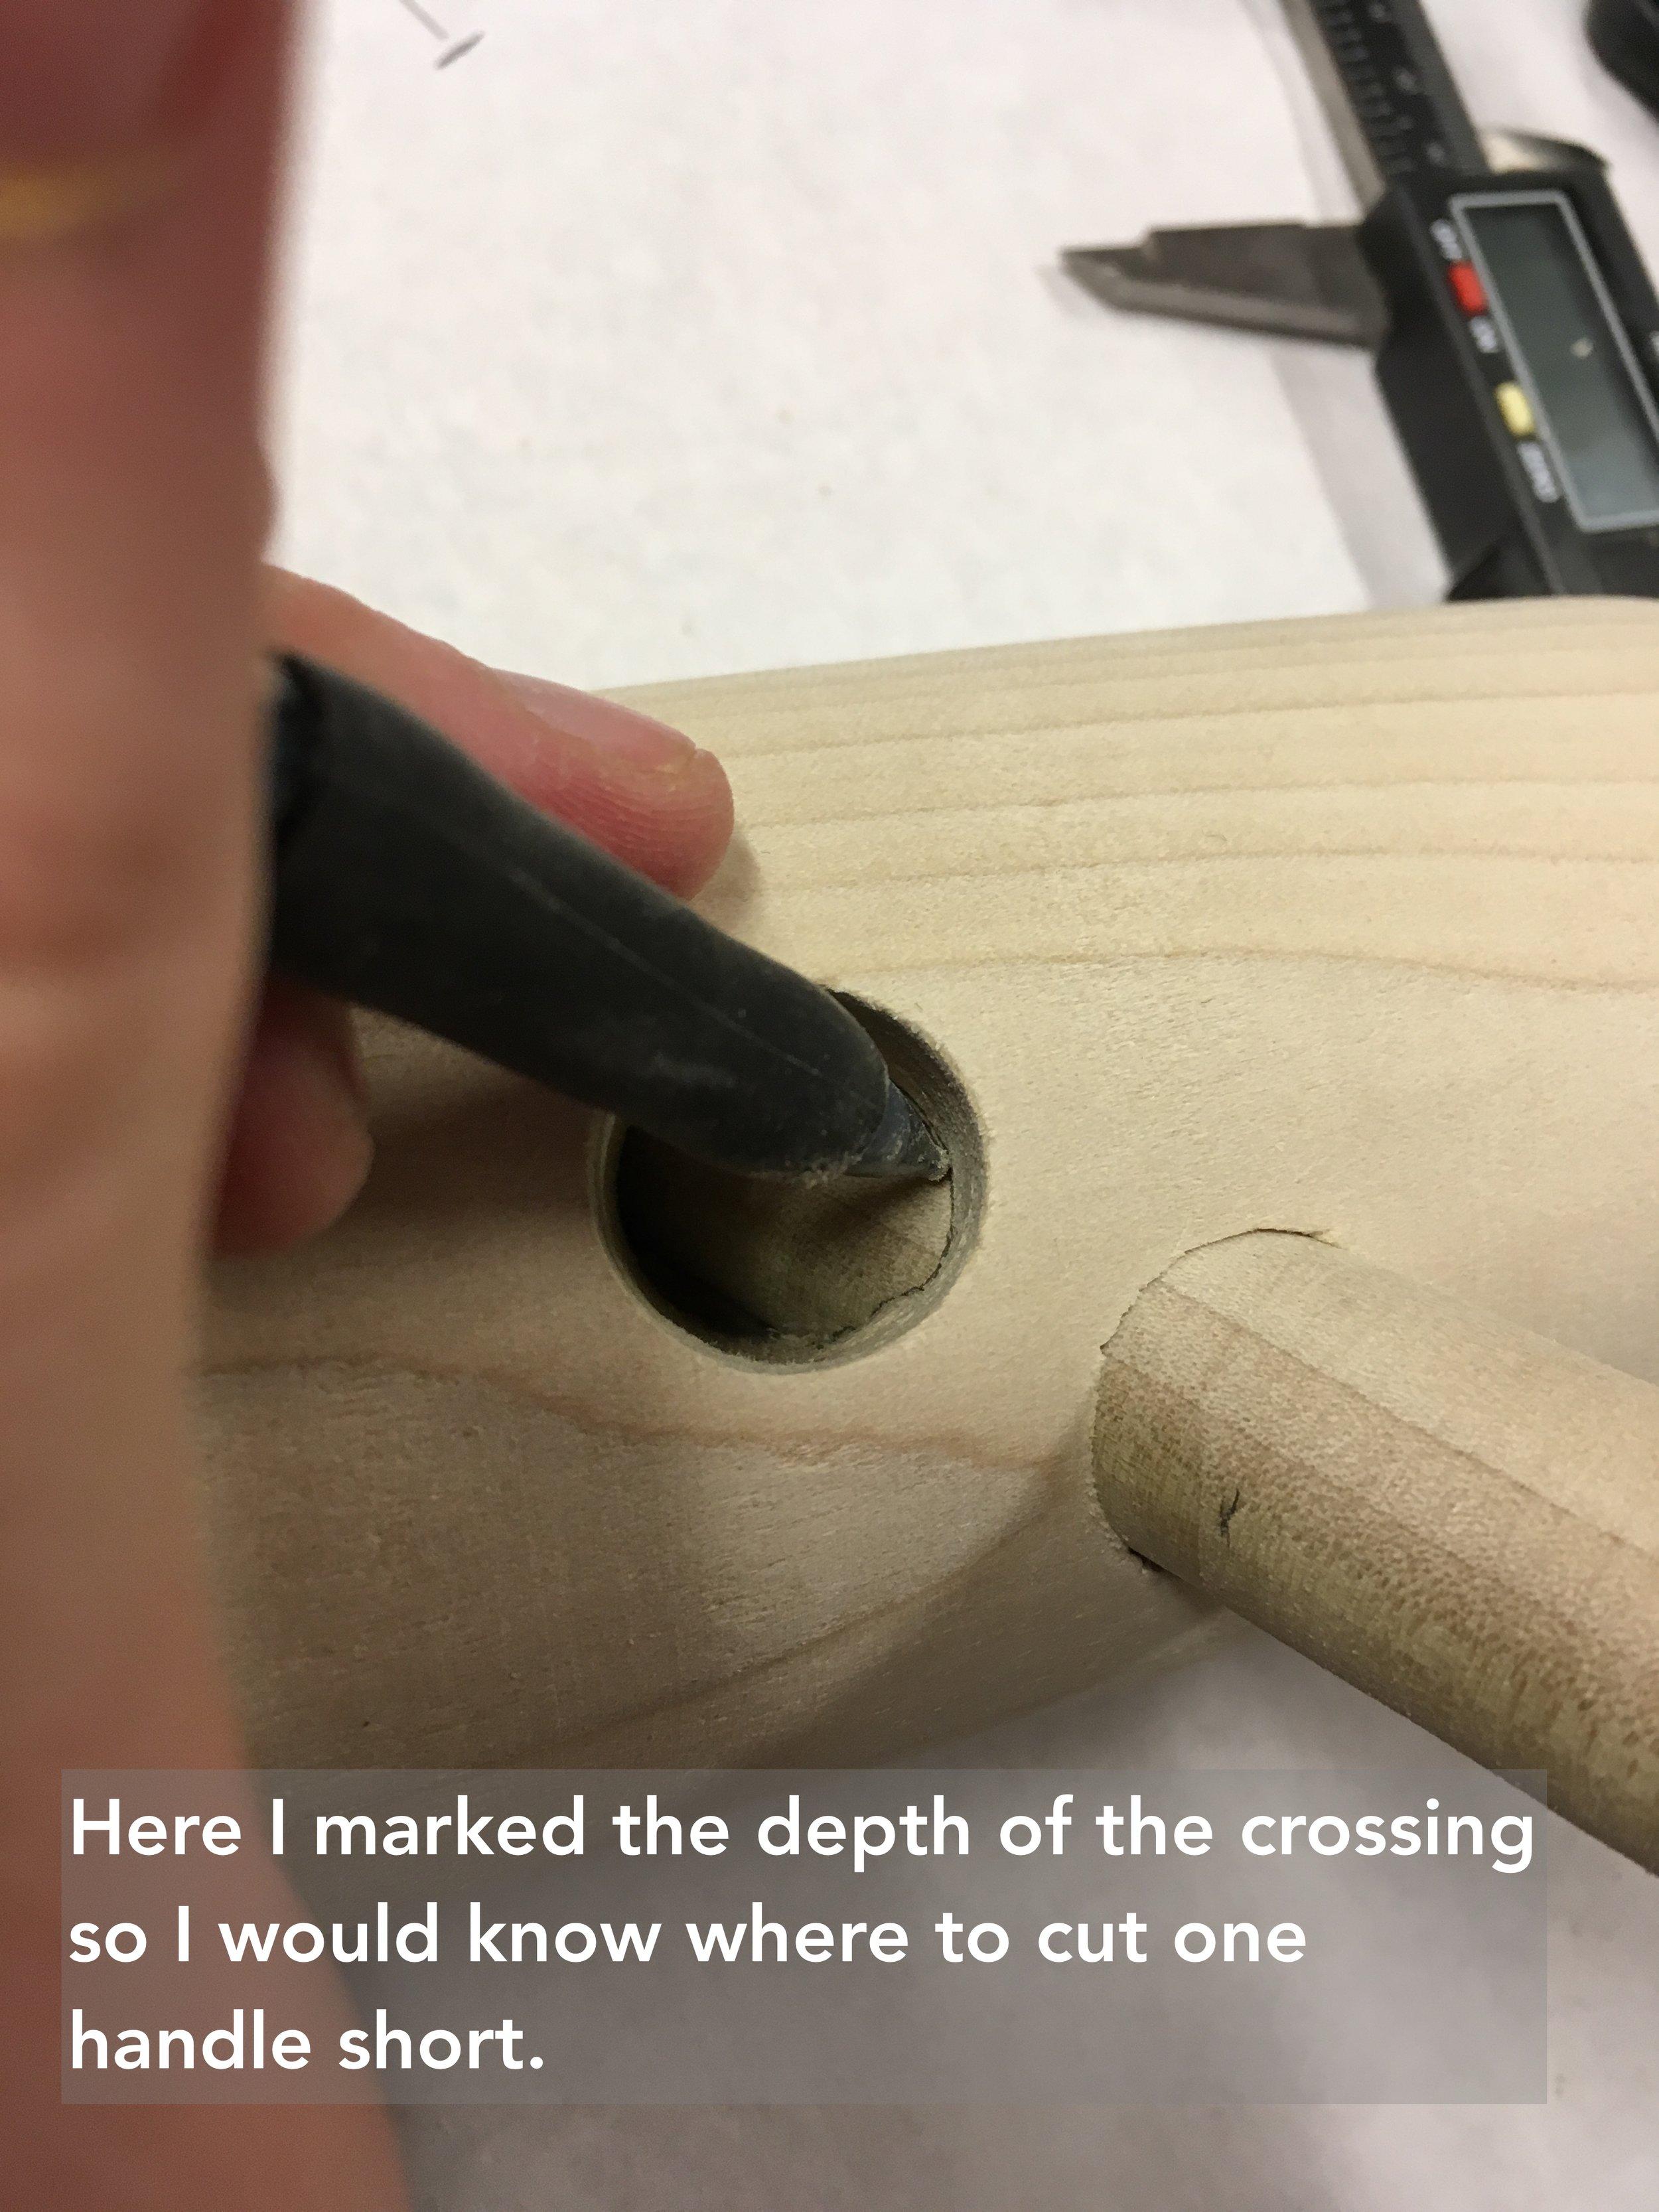 21 marking the hole depth.JPG